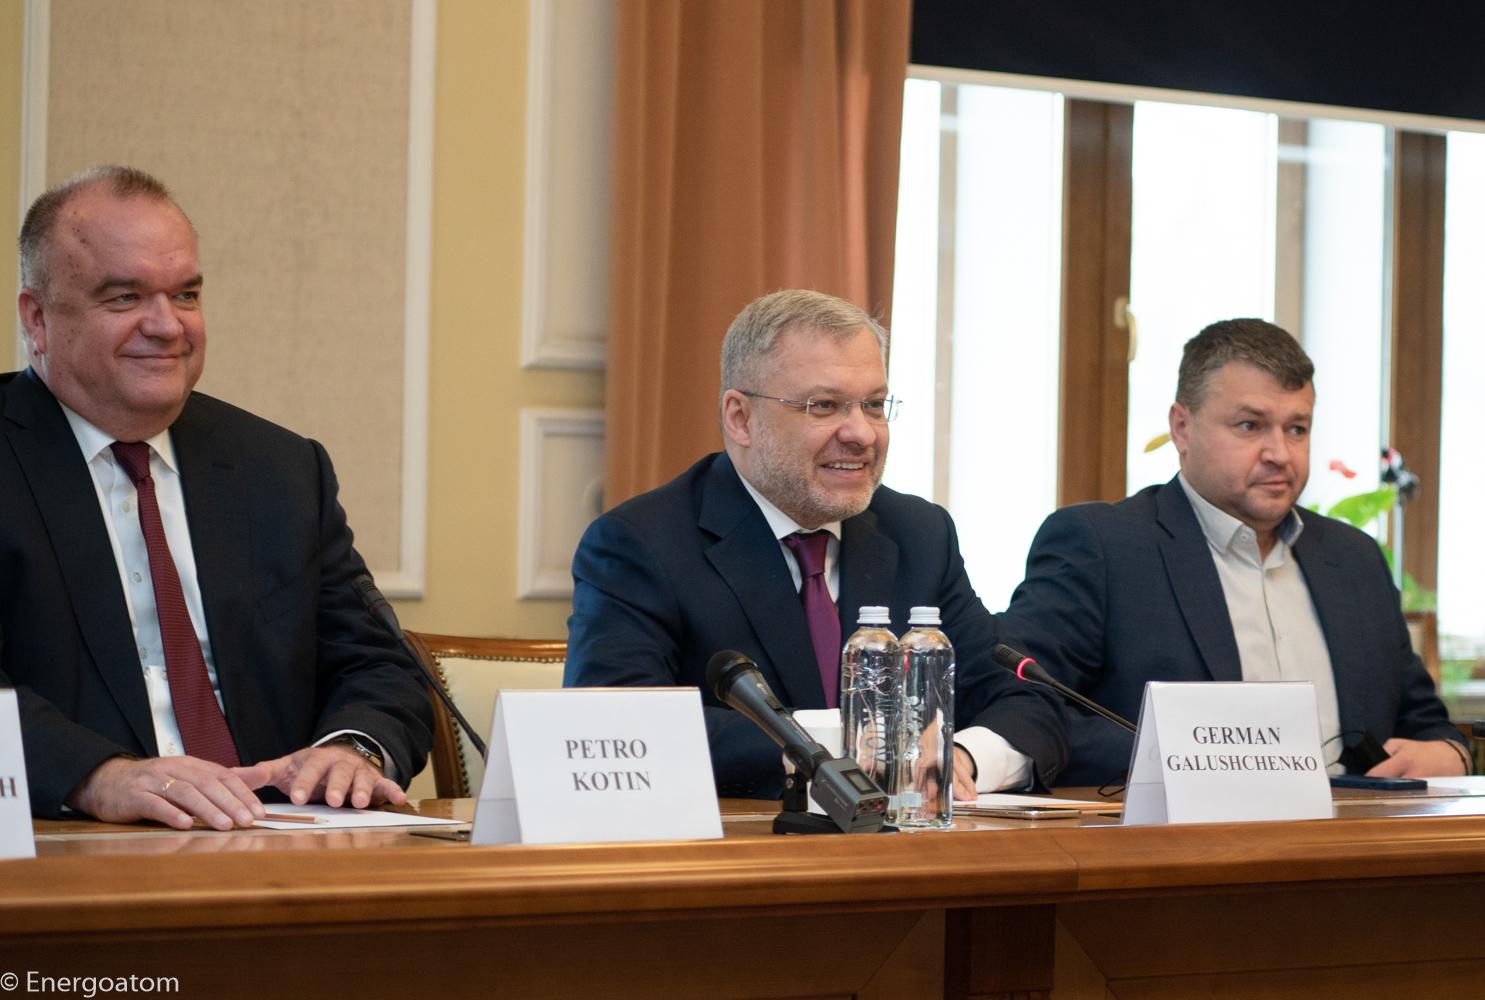 Petro Kotin, Herman Halushchenko a Aziz Dag